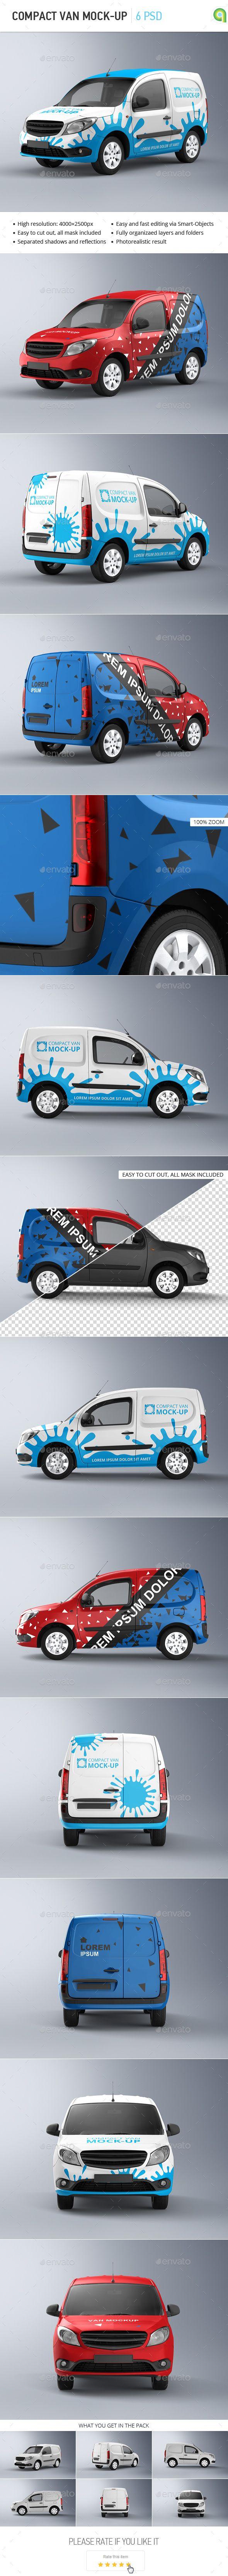 Car sticker design download - Compact Van Mock Up